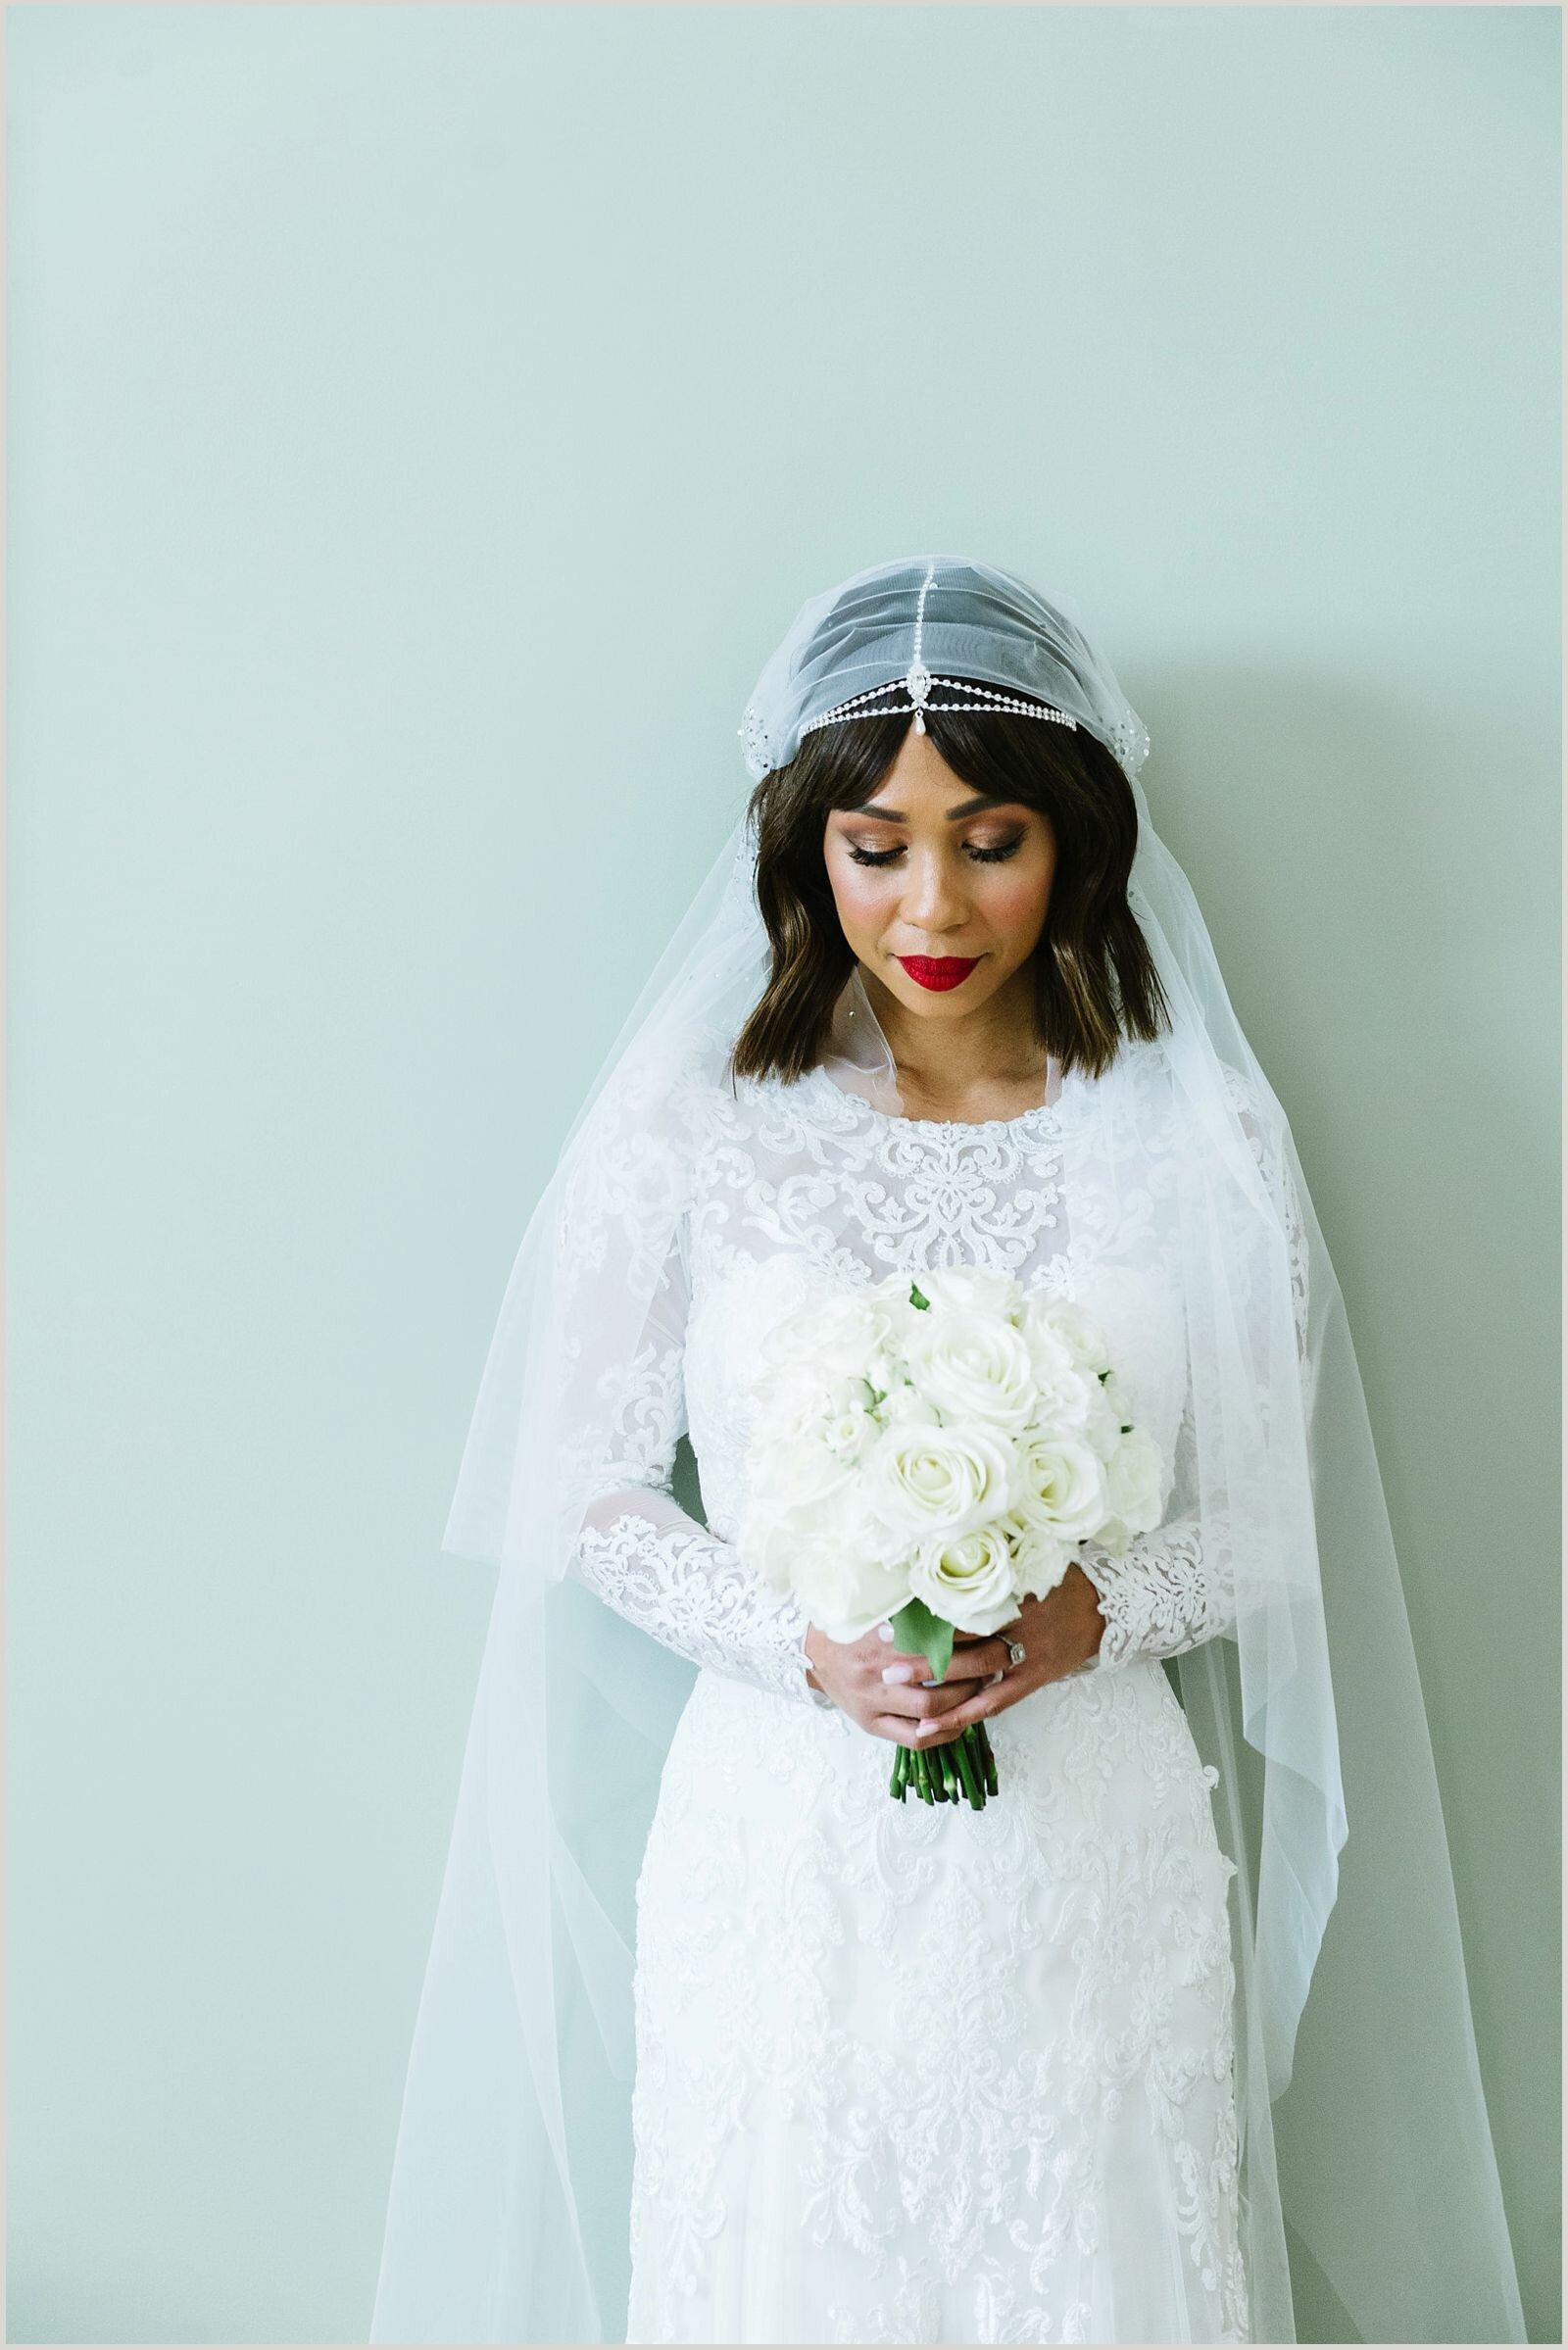 joseph_koprek_wedding_melbourne_the_prince_deck_0014.jpg